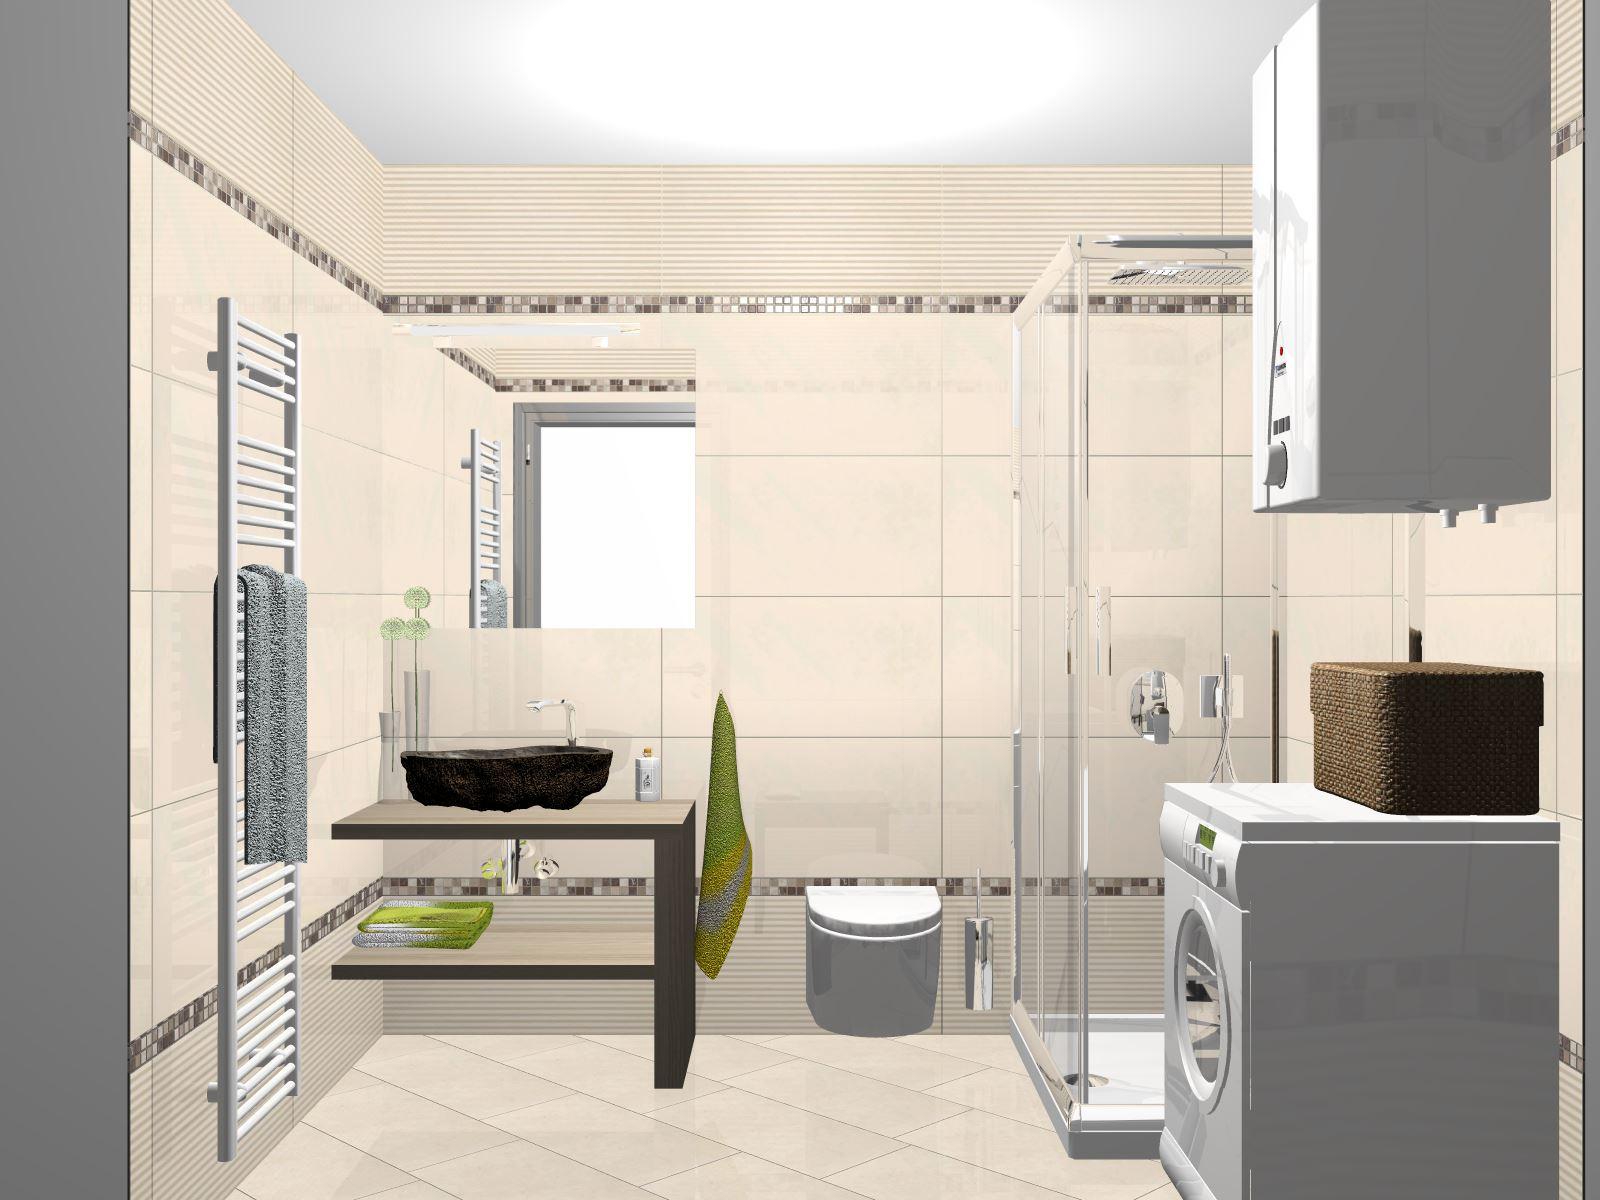 superges re si de bathroom by pirman romana trgocev d o o on visoft360 portal. Black Bedroom Furniture Sets. Home Design Ideas